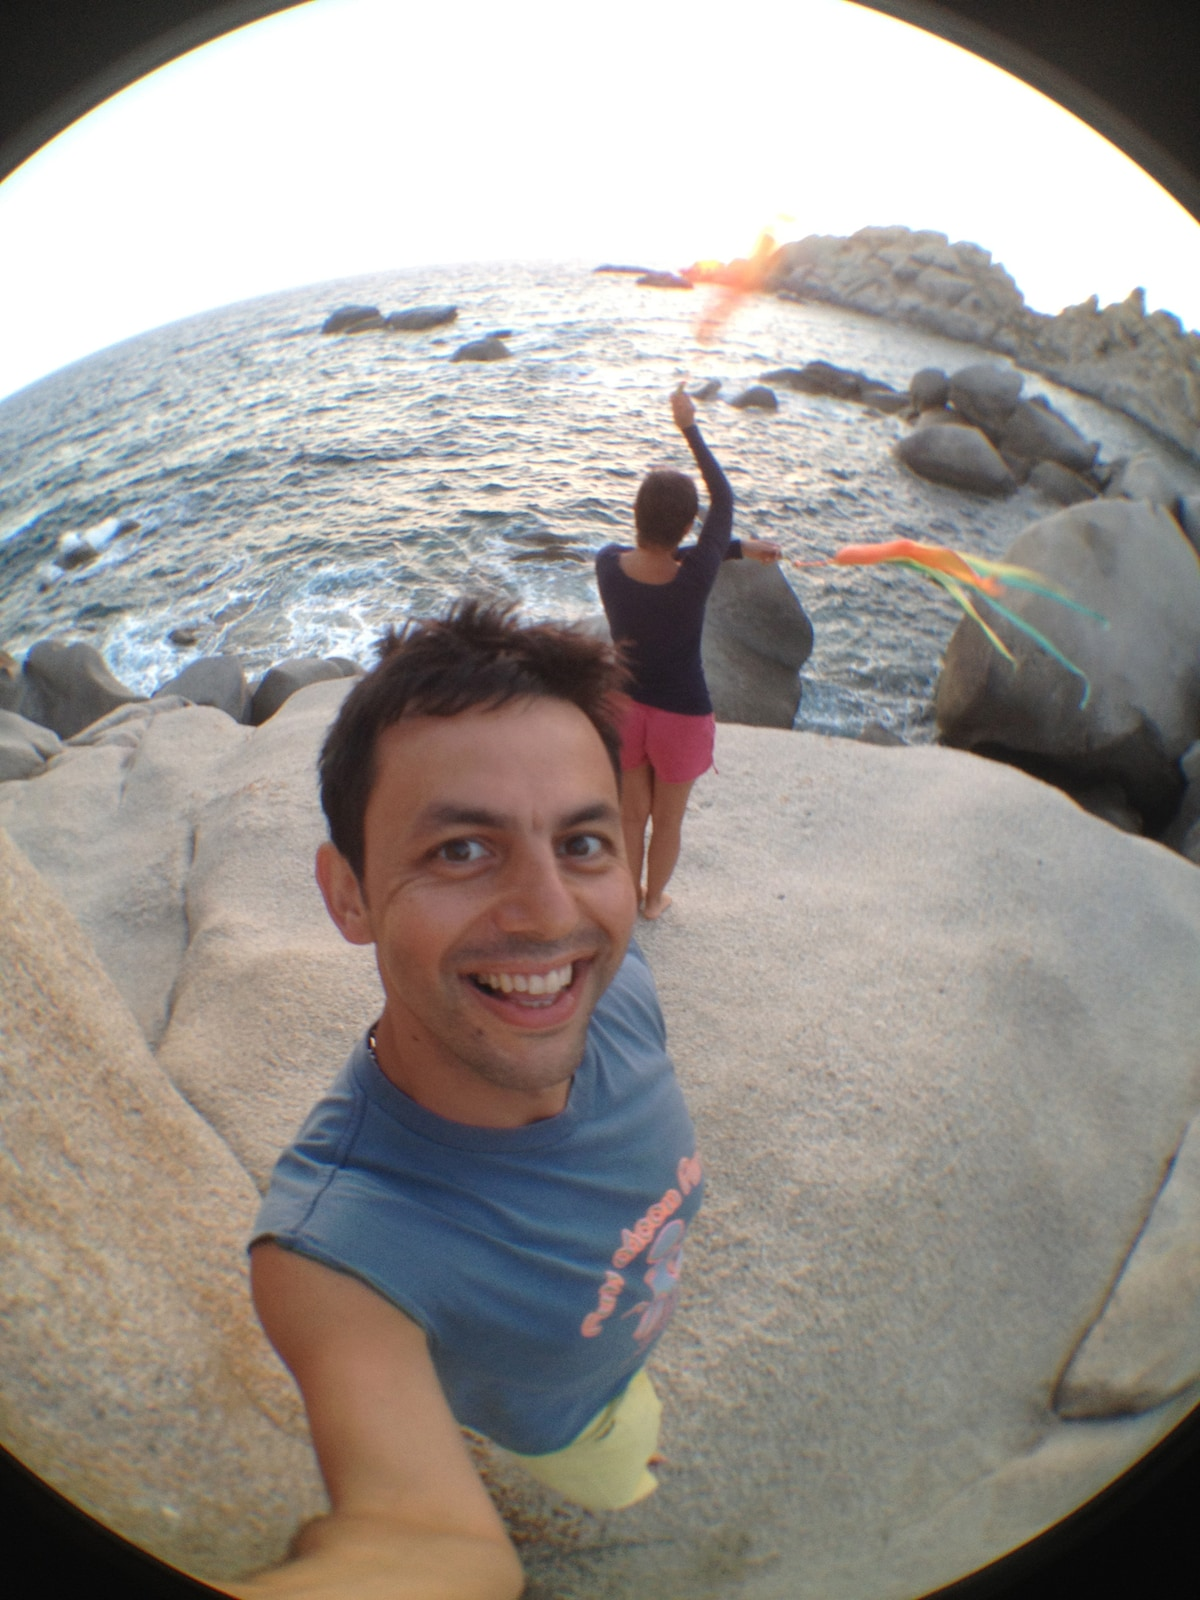 Simone from Costa Paradiso